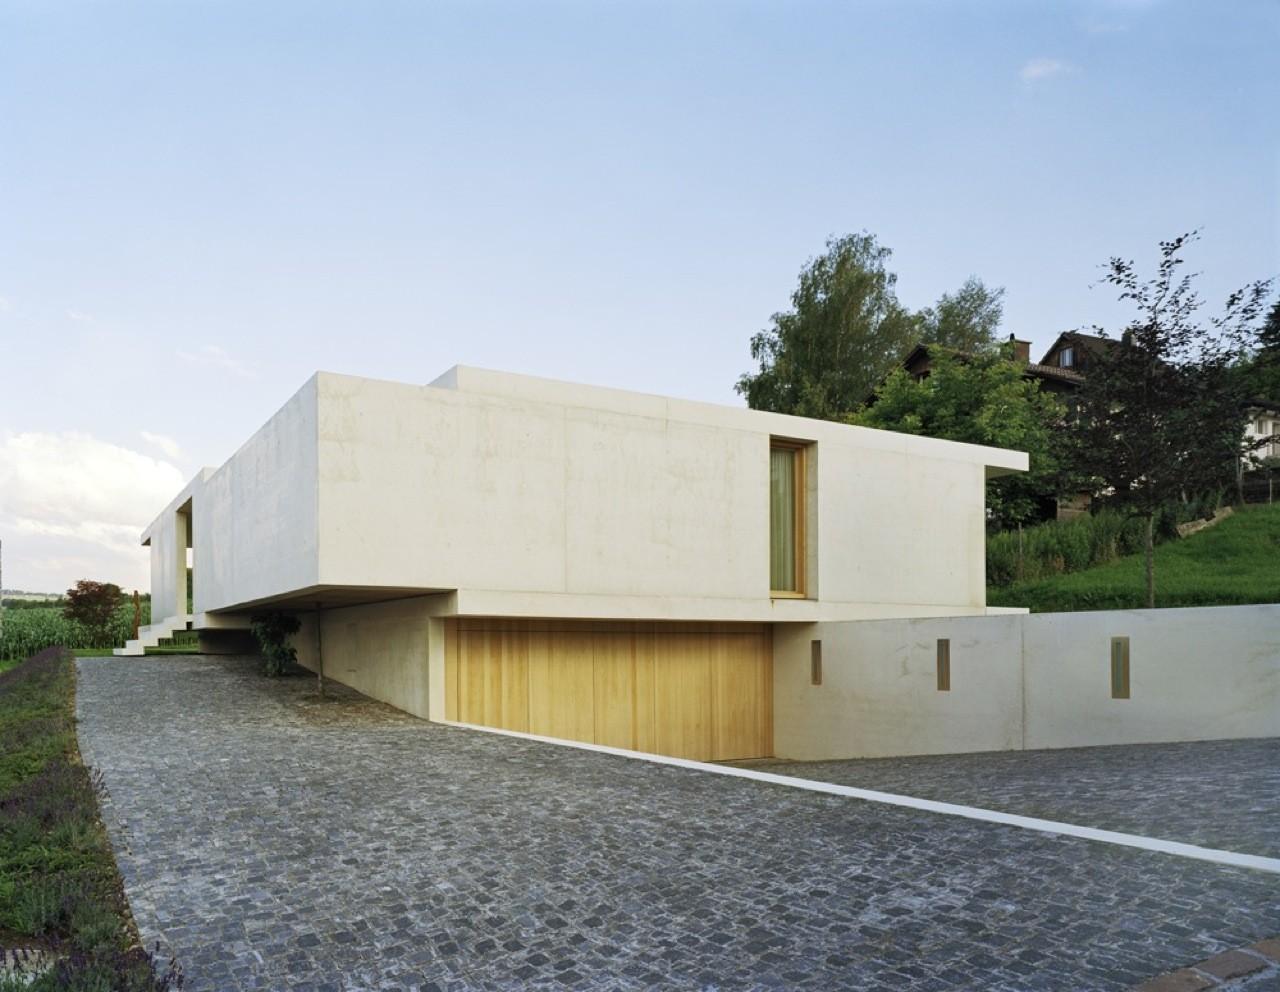 gallery of house at zimmerberg bottom rossetti wyss architekten 17. Black Bedroom Furniture Sets. Home Design Ideas